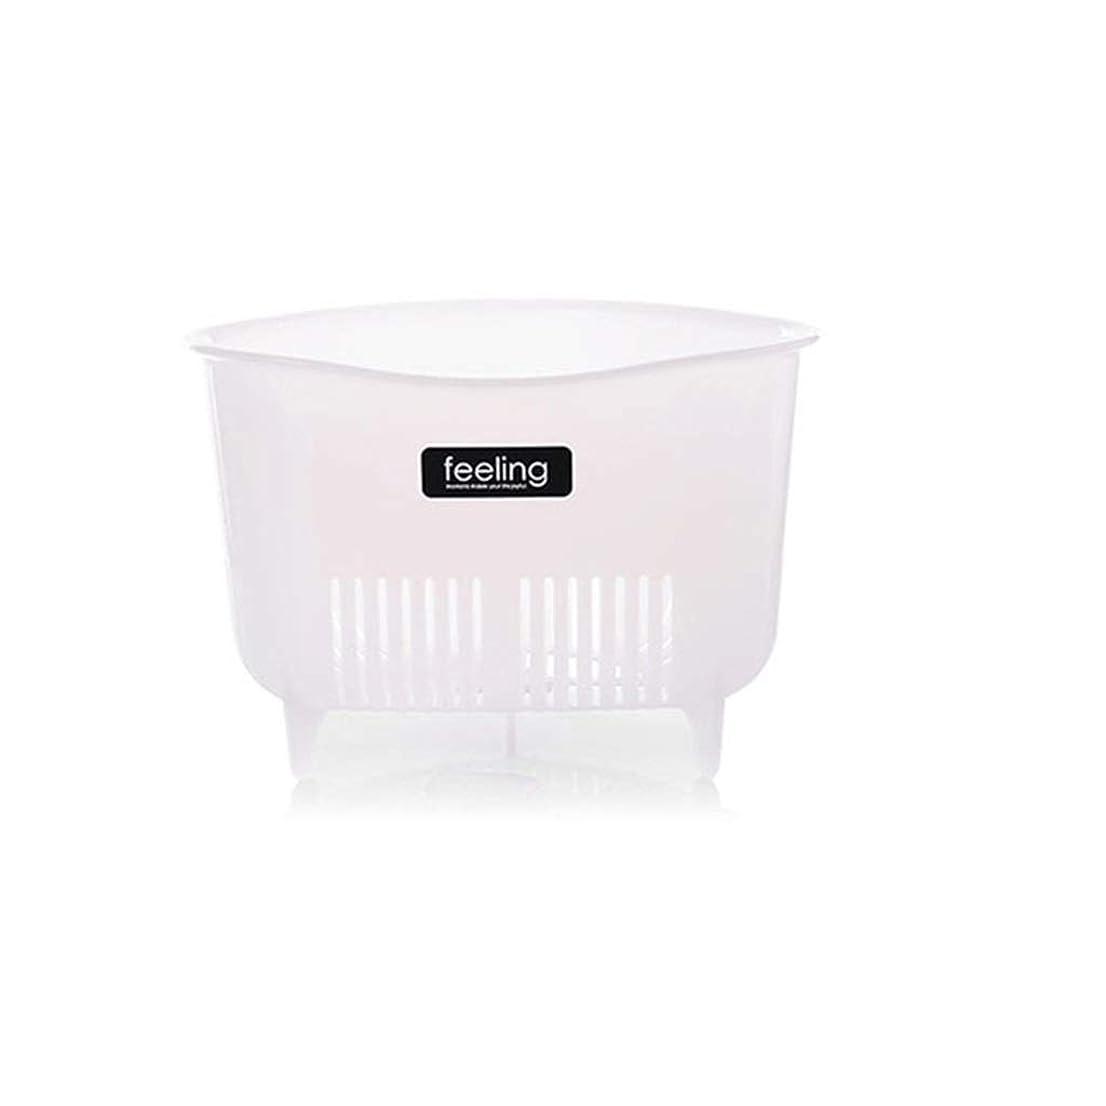 IUYWL 三角形のシンクプラスチックドレンラック、キッチンラック、フルーツバスケットを洗う キッチンドレンラック (Color : White)